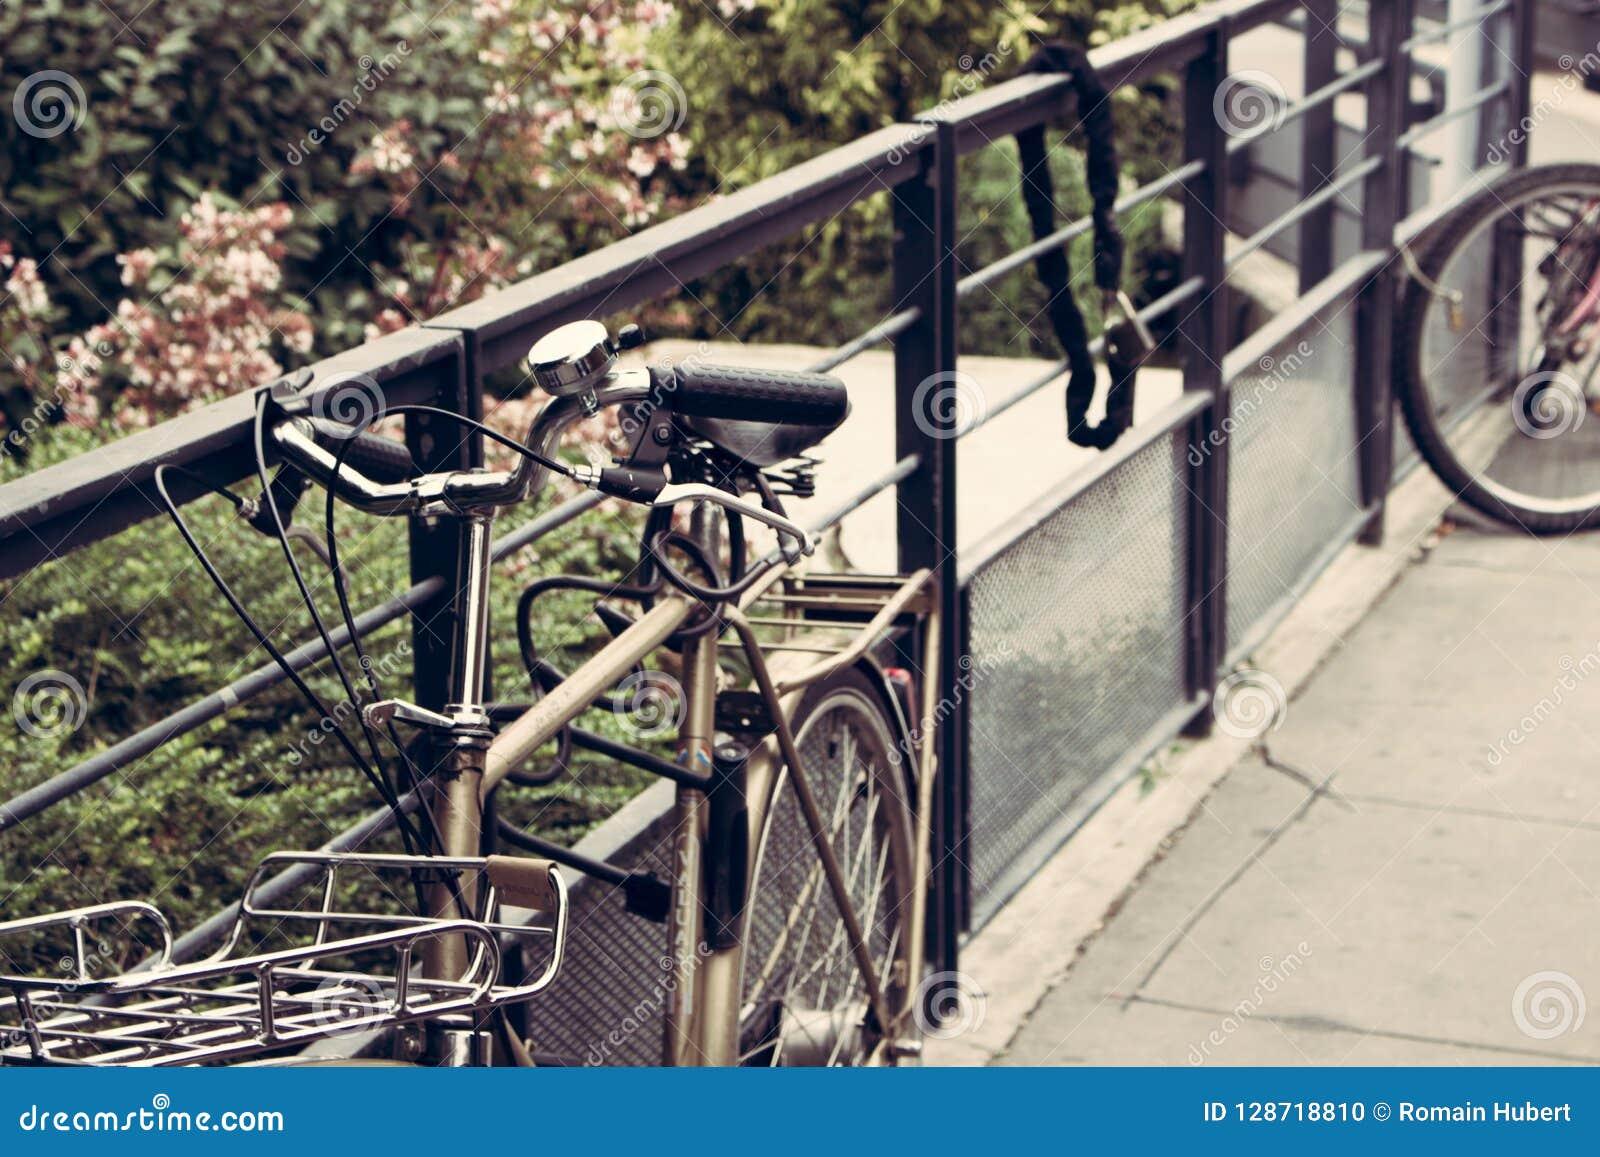 Metal bike hanging on a fence